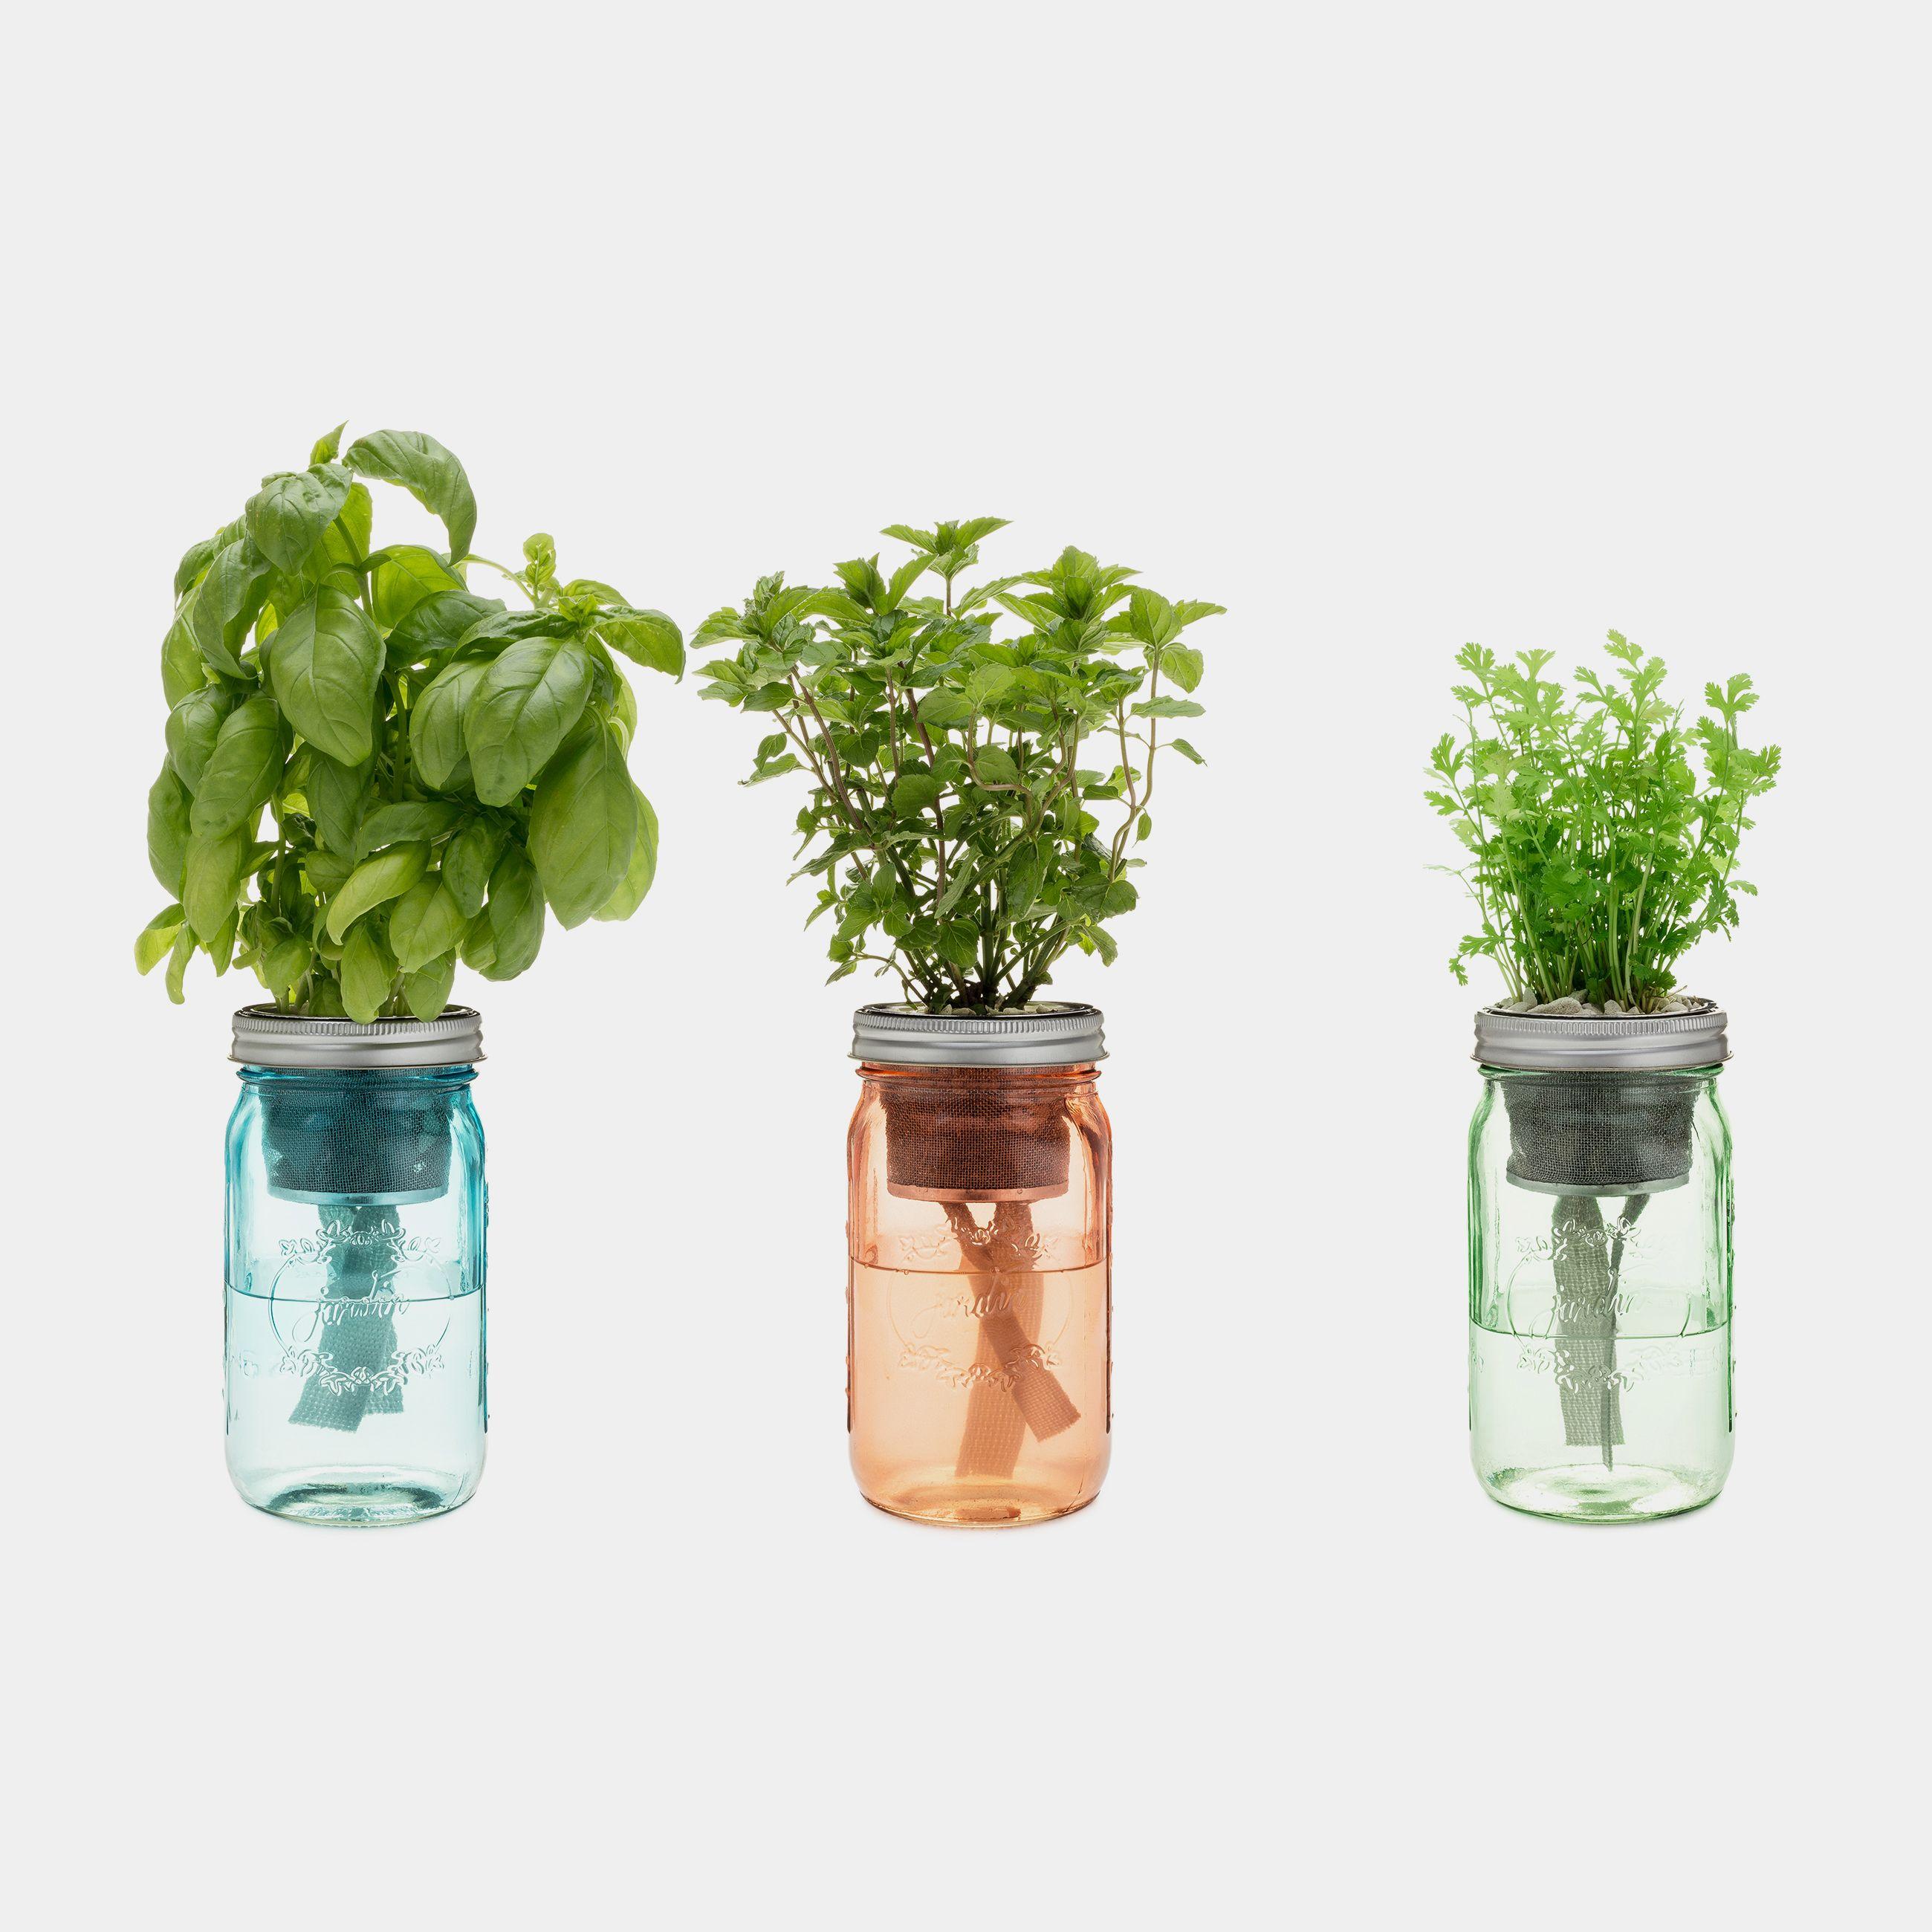 Garden Jar Herb Kits 3 Pack Brit Co Shop